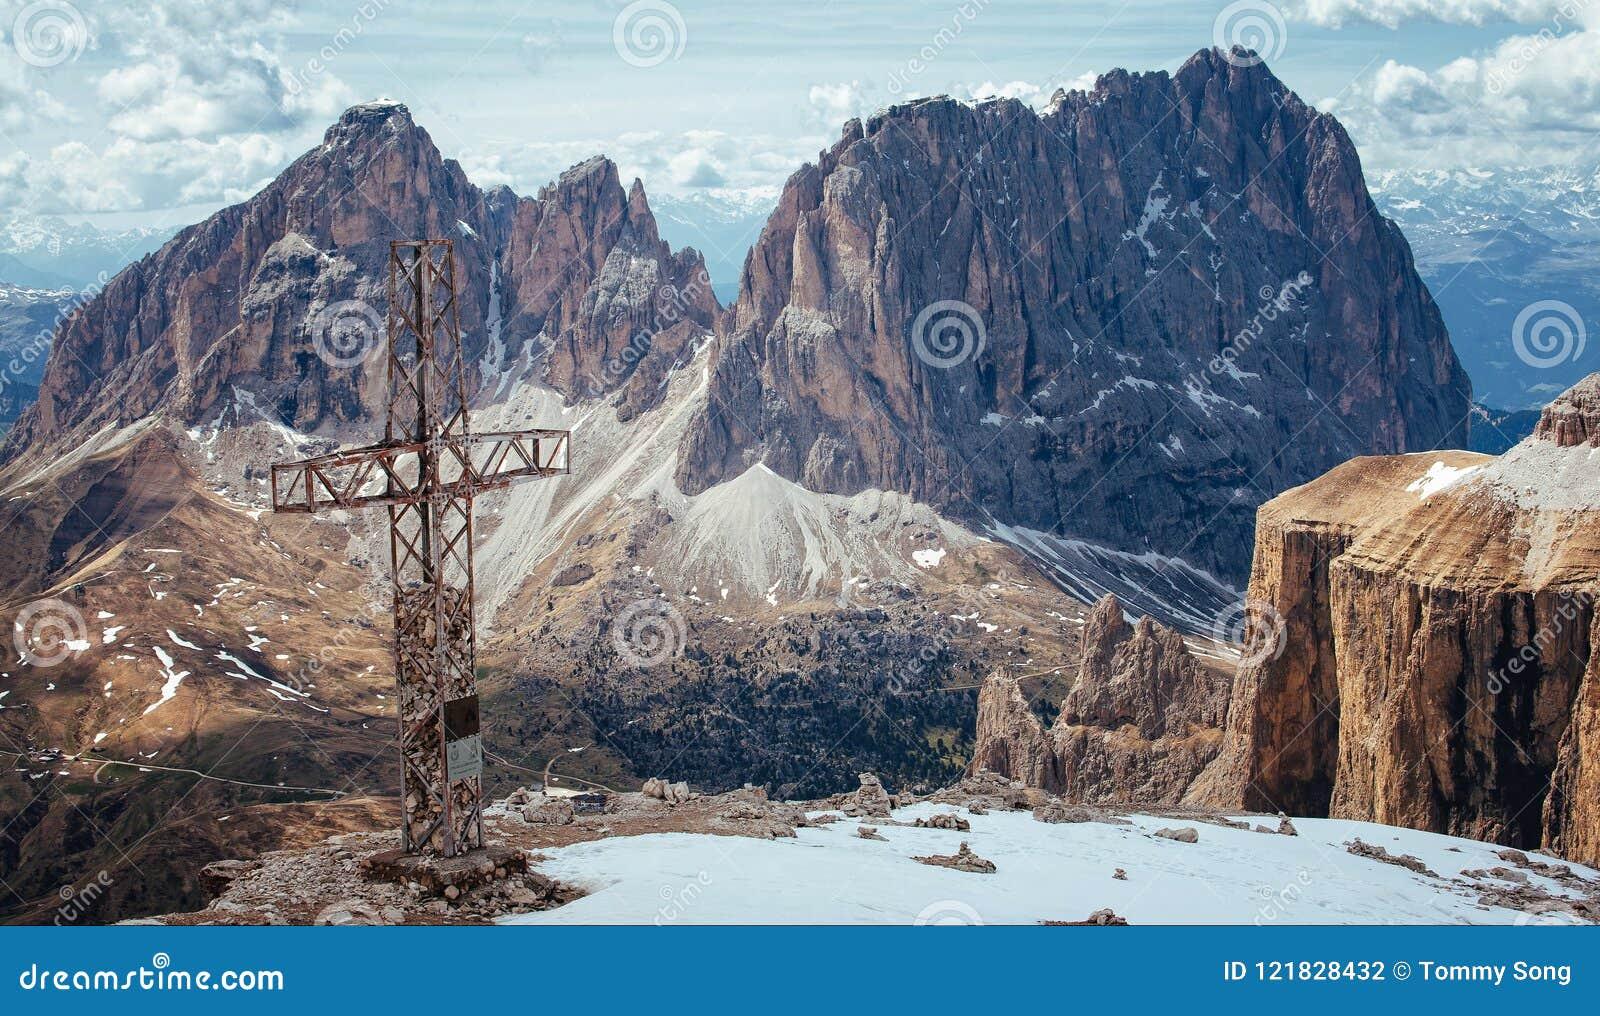 Iron Cross on top of Sass Pordoi, Italian Dolomites